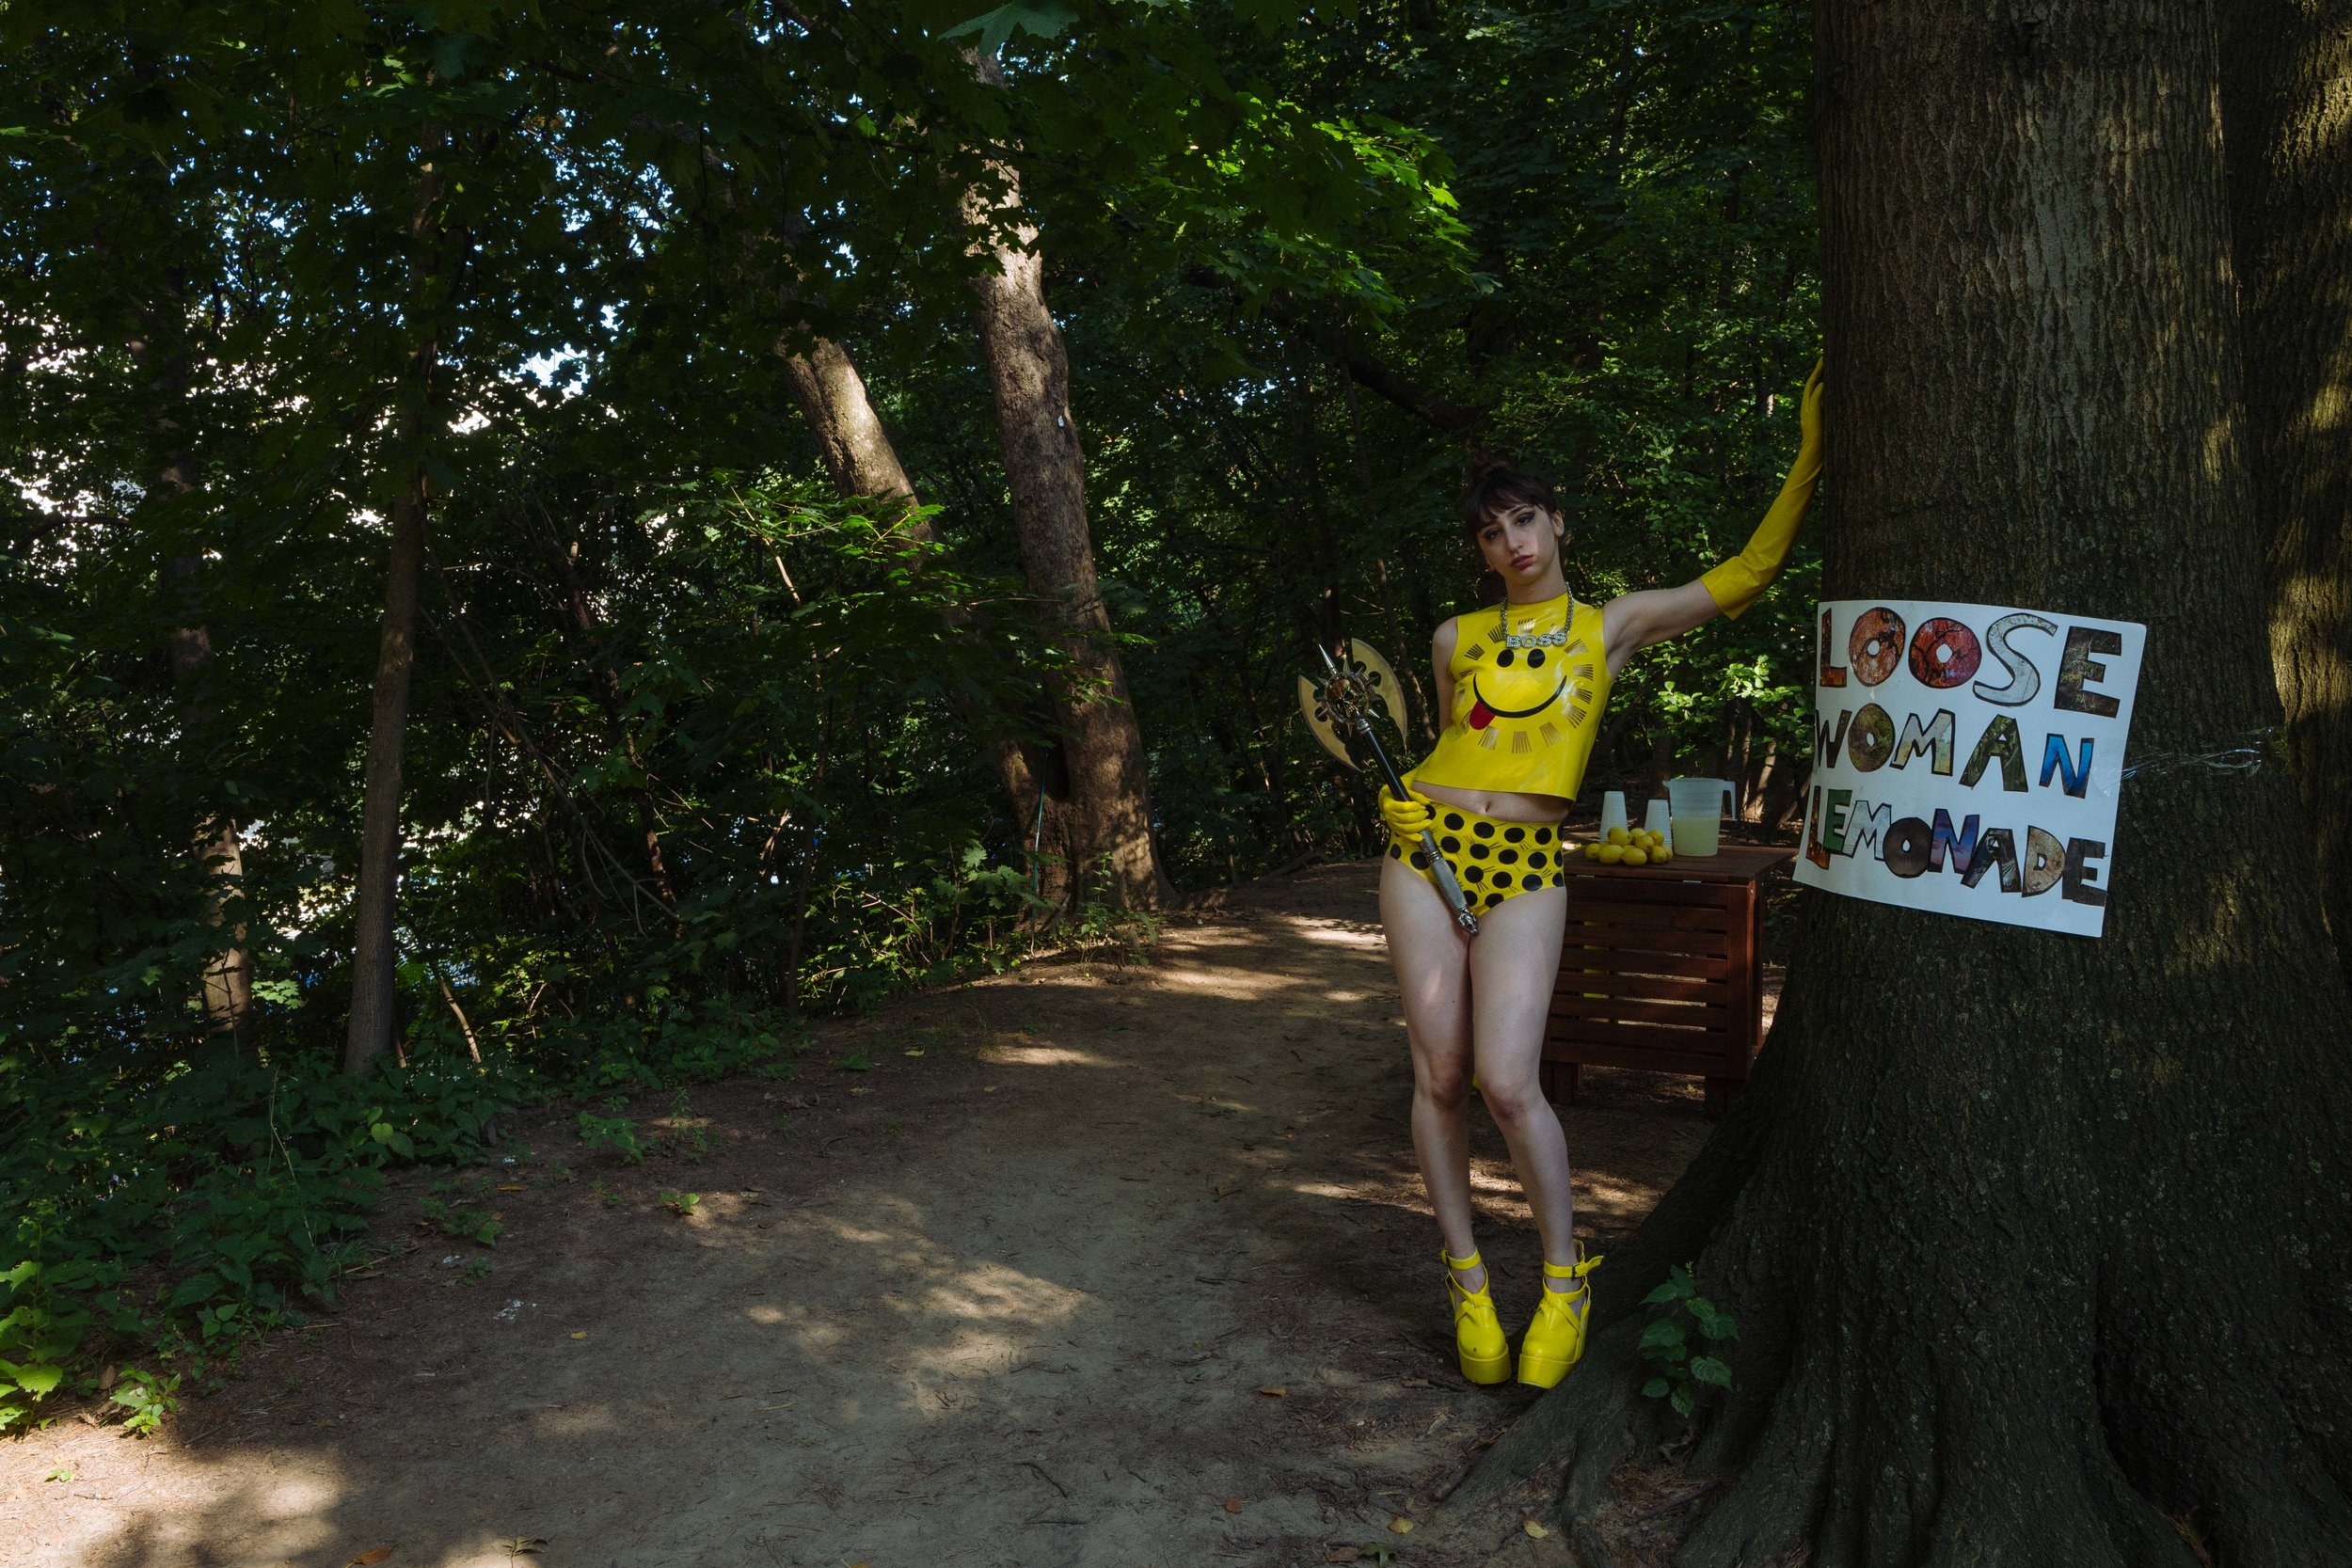 Loose Woman Lemonade